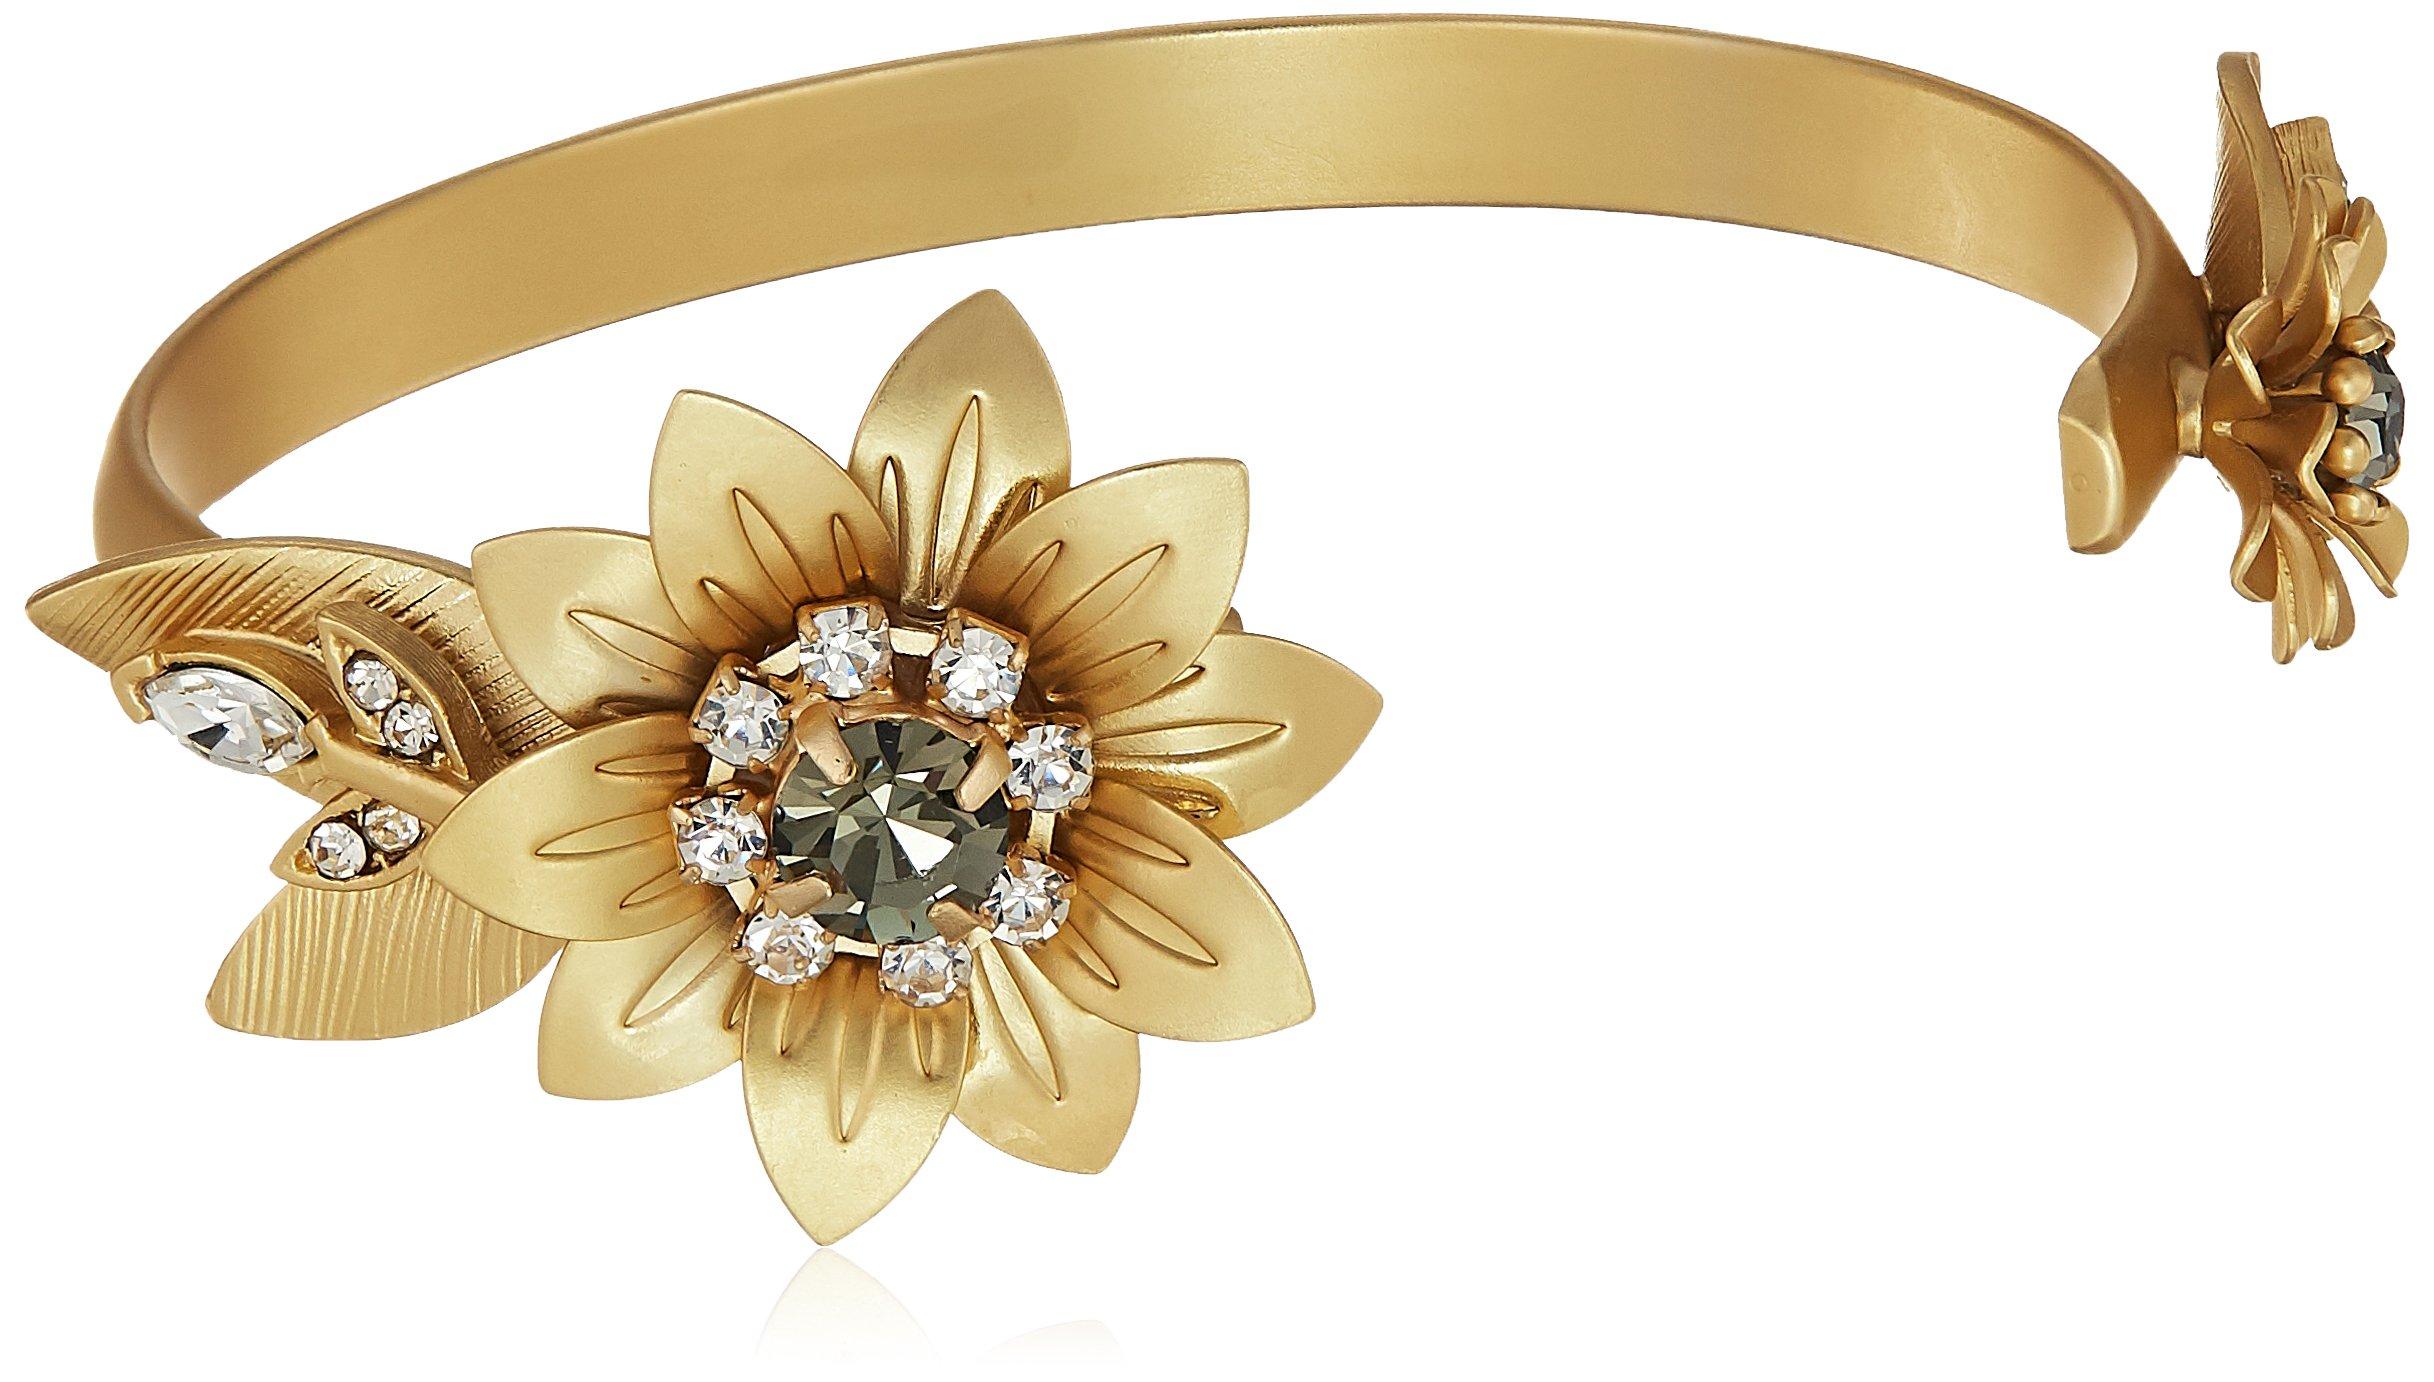 Badgley Mischka Women's Petal Gold Cuff Bracelet, One Size